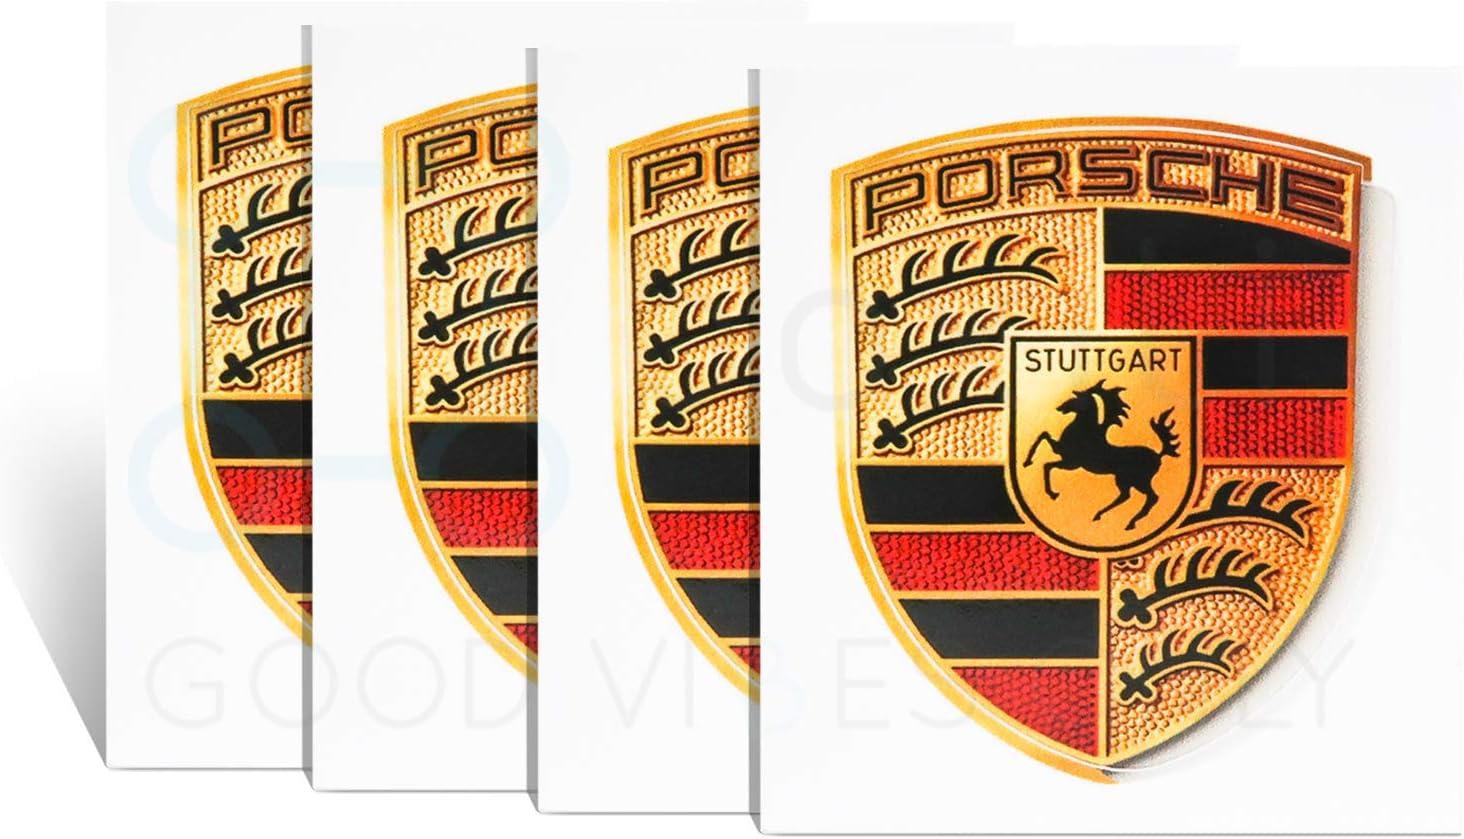 Amazon Com Genuine Crest Sticker Of Porsche Logo 4 Pack 65mm X 53mm Including Wipe Gt3 Rs 4 0 Gt2 Style Porsche Emblem Logo Sticker Automotive